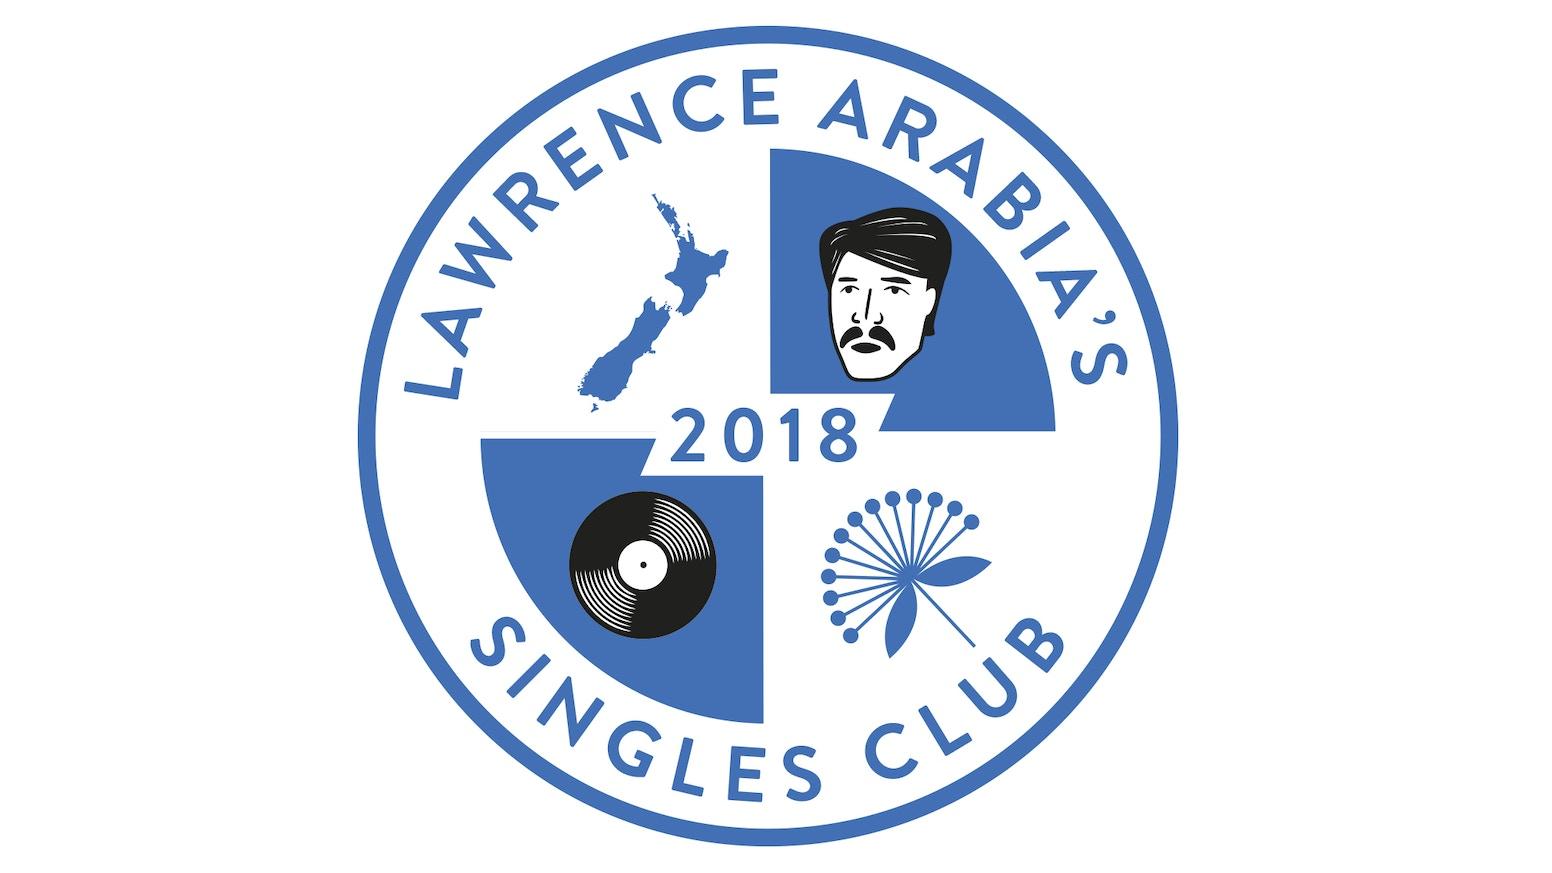 singles clubs norfolk